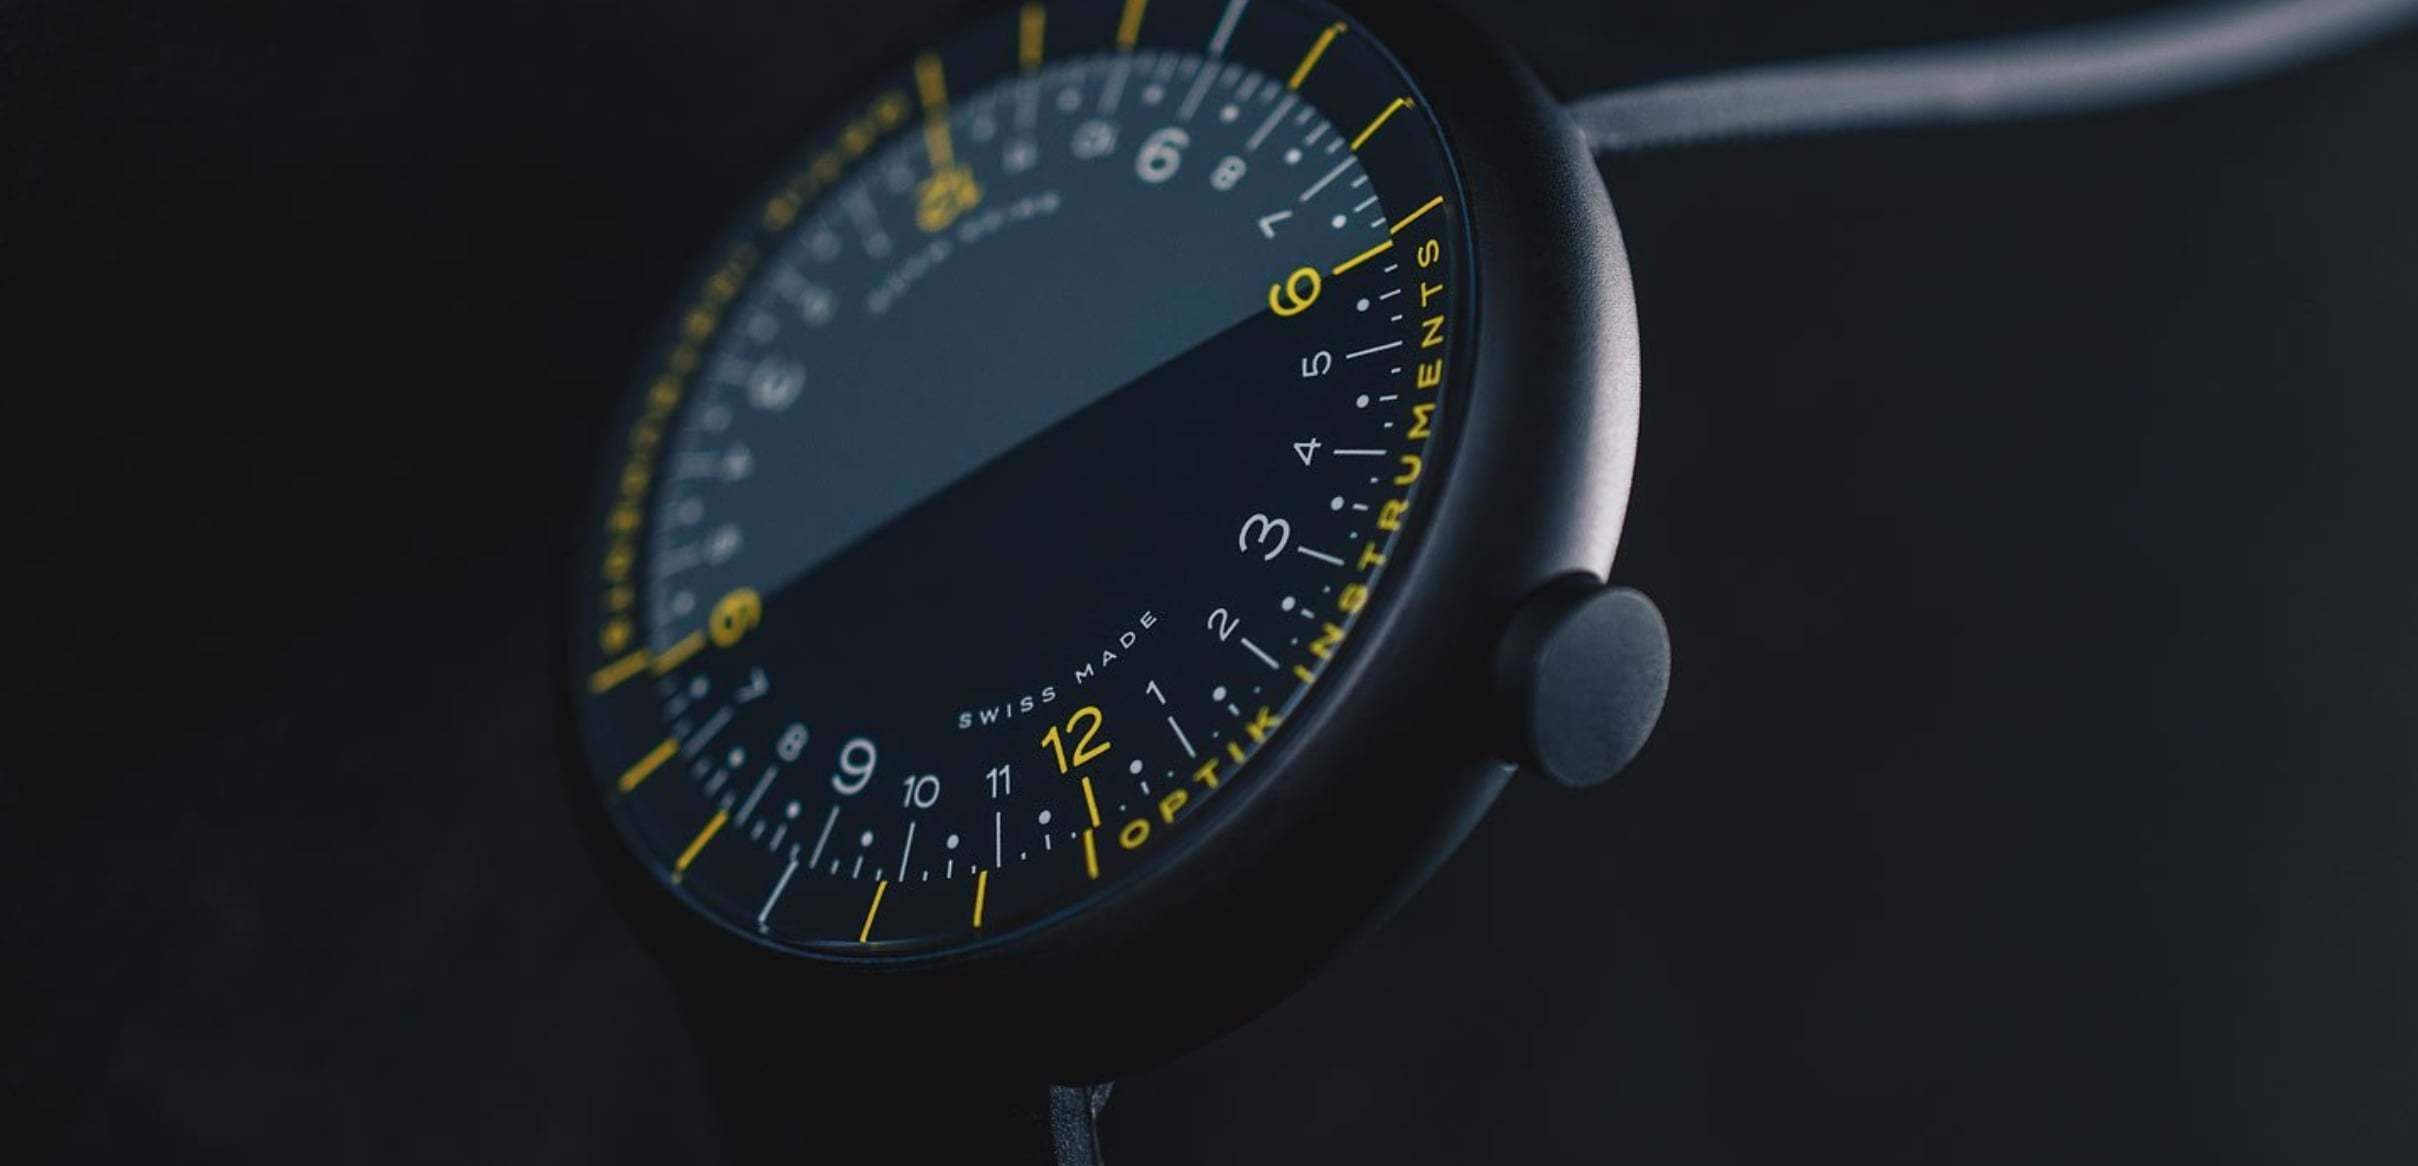 horizon_optik instruments_saat_kickstarter_bigumigu_6